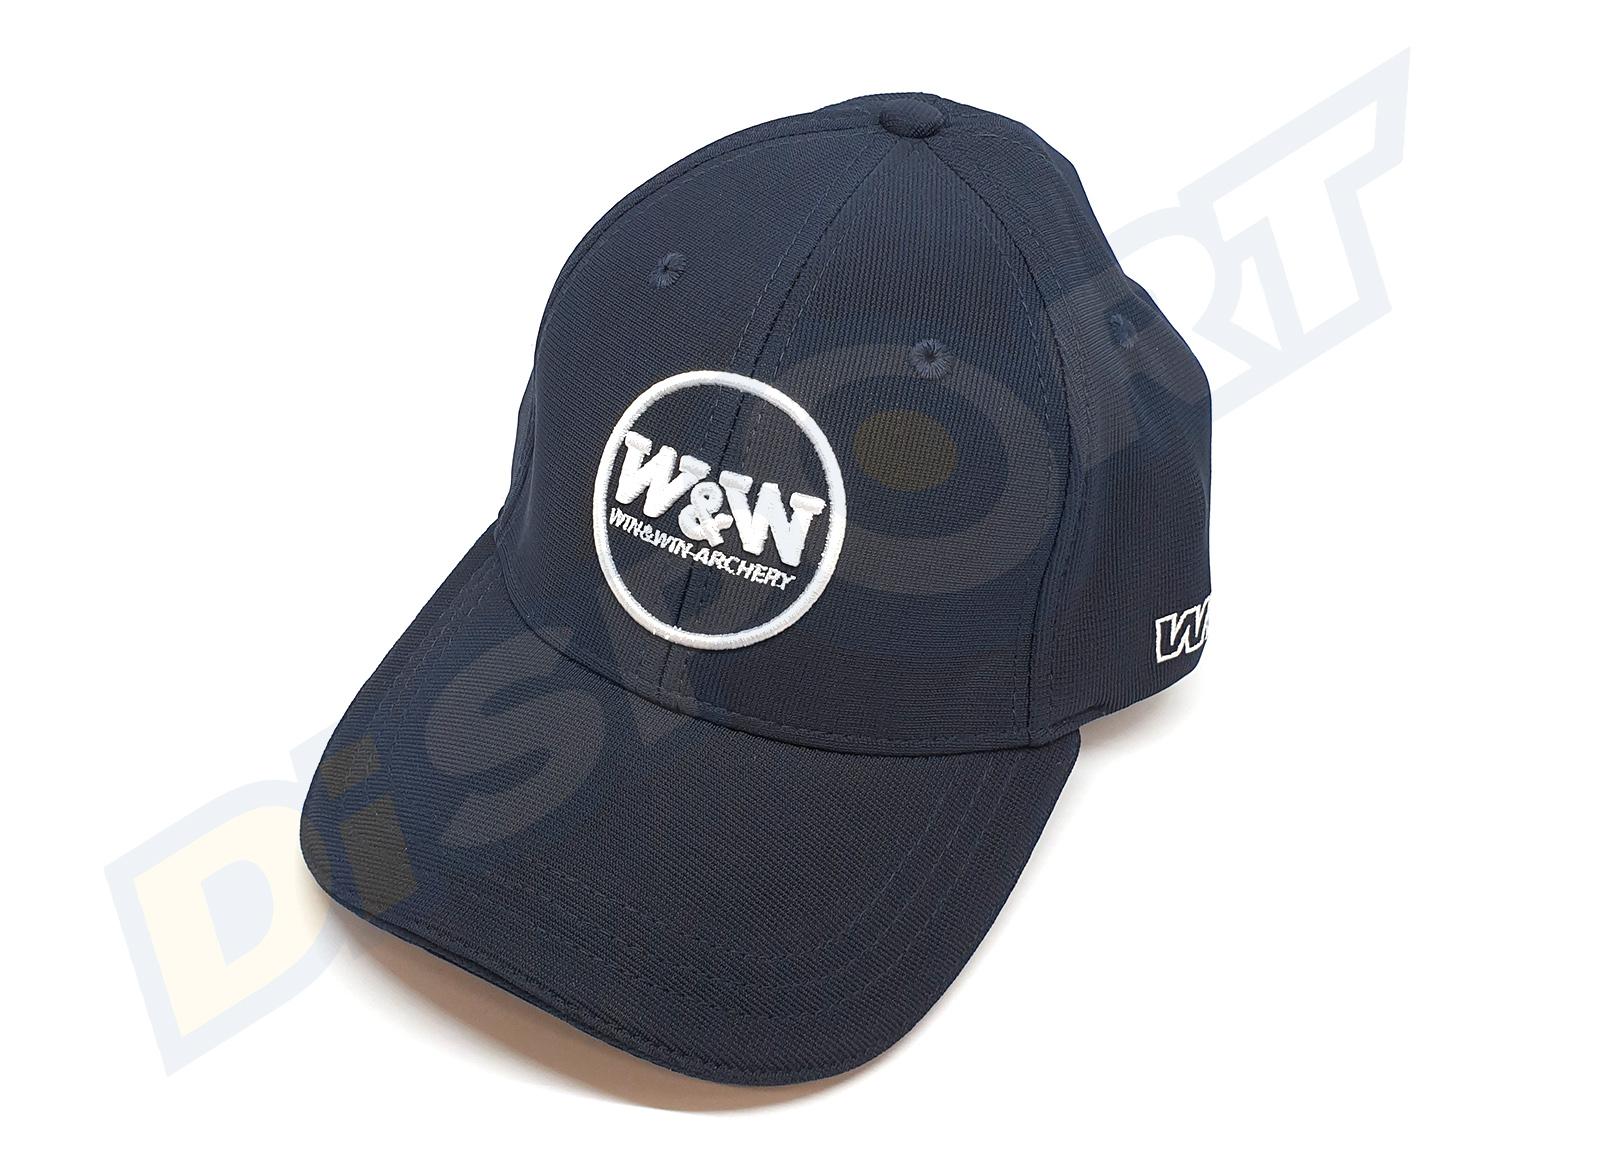 WIN&WIN WIAWIS NAVY BALL CAP